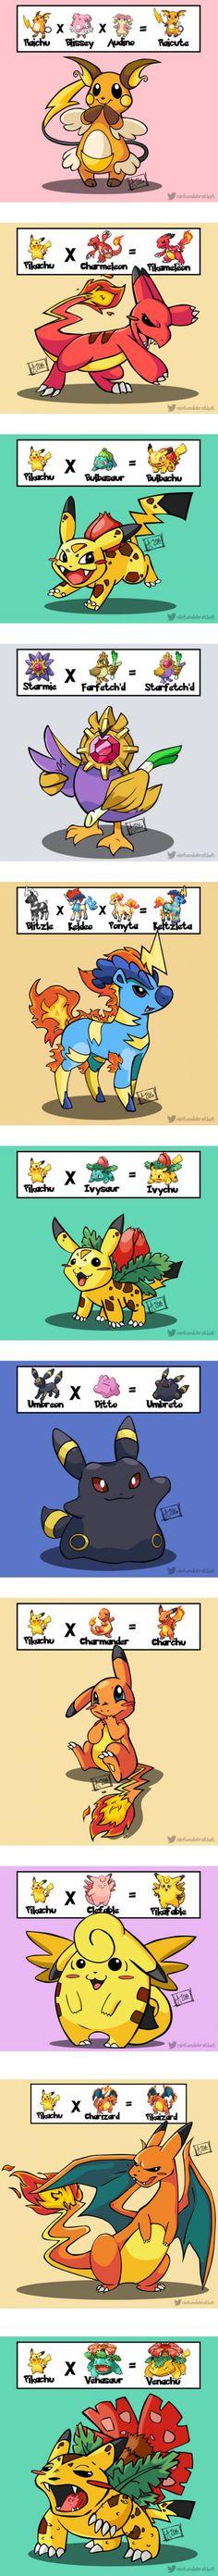 What is your dream Pokémon combination? More